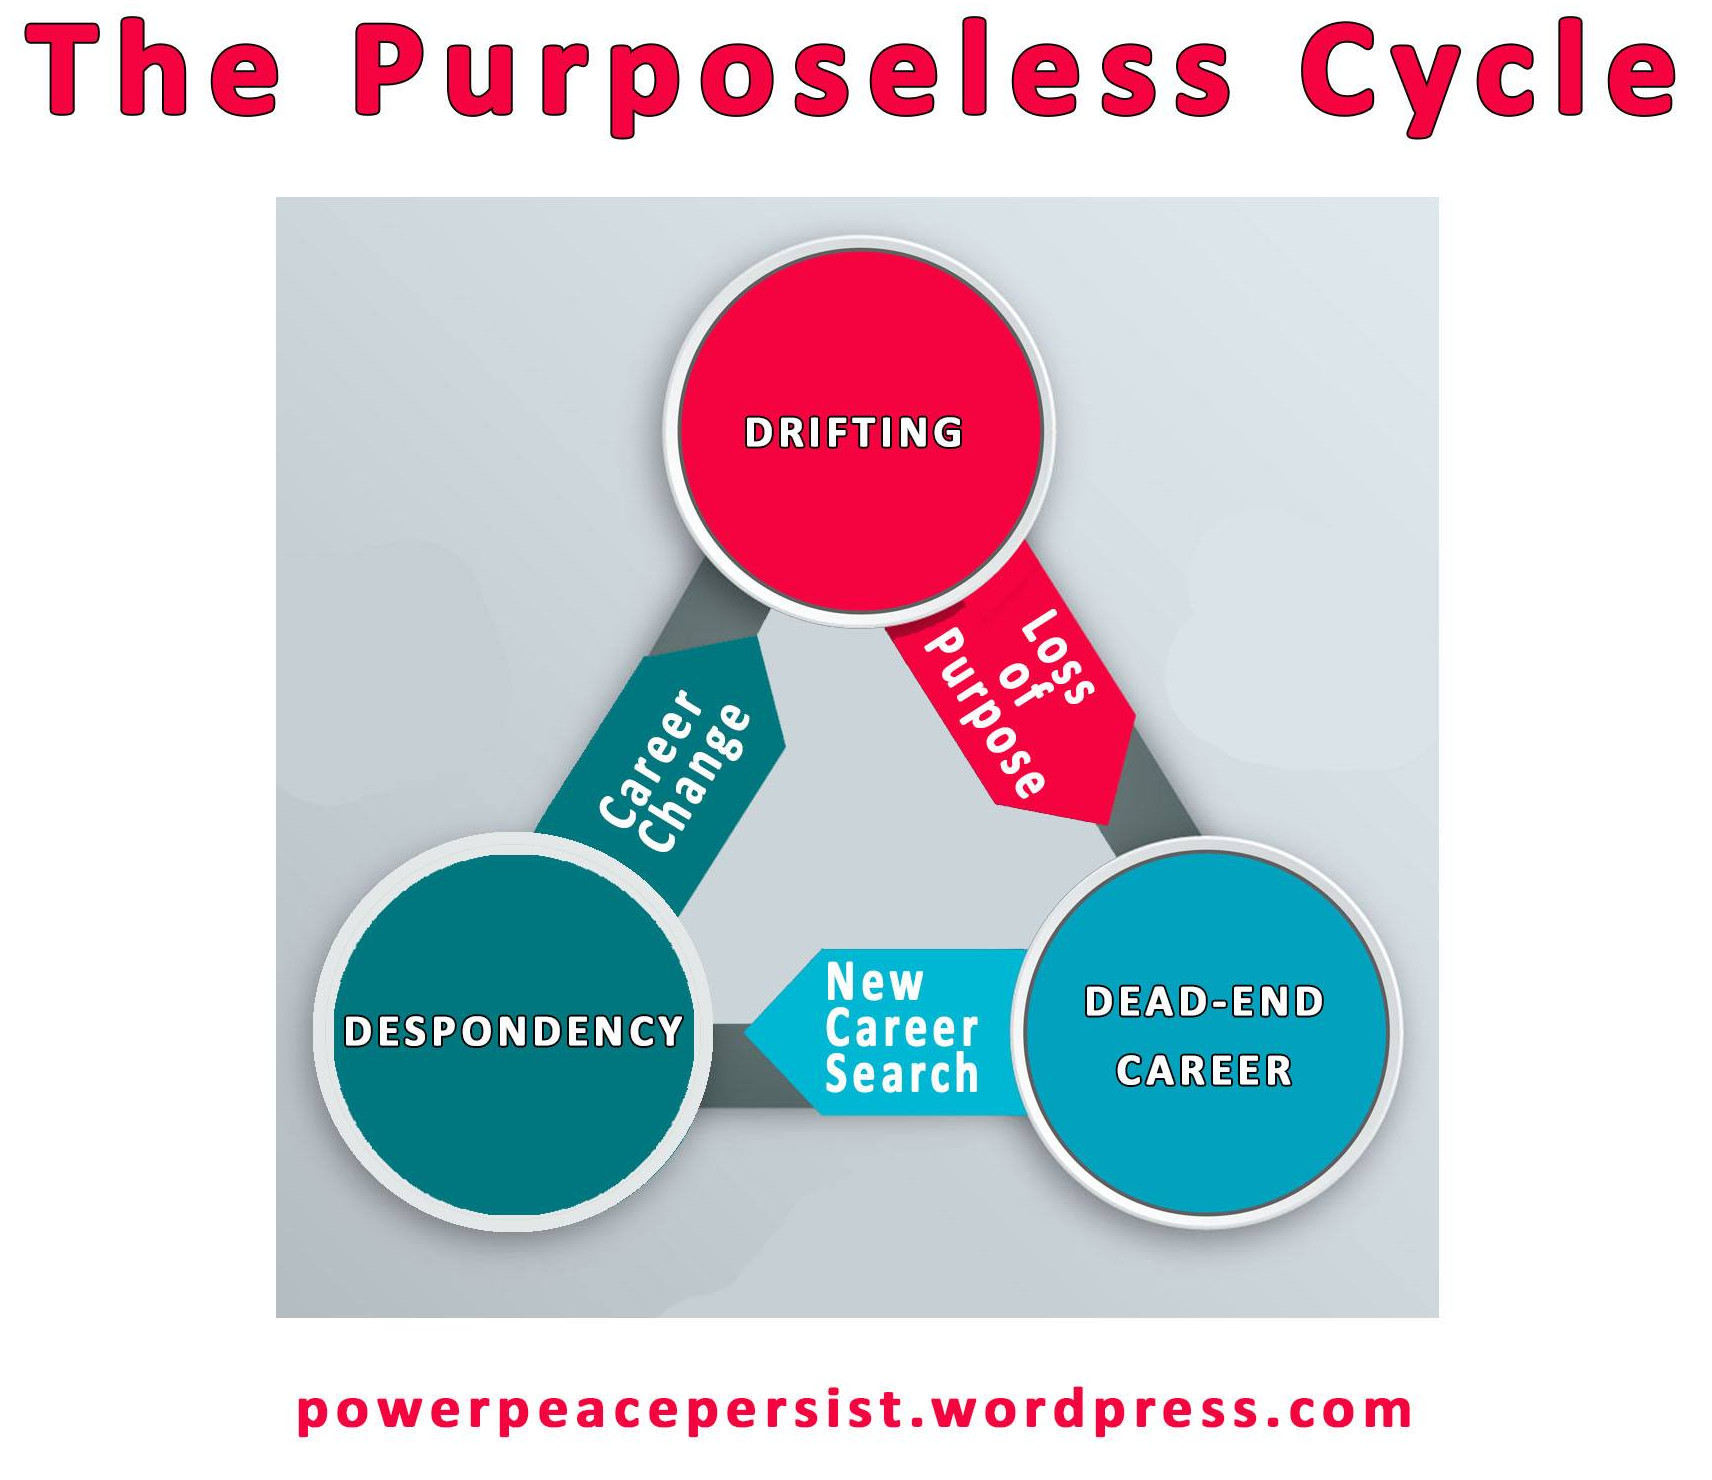 The purposeless cycle